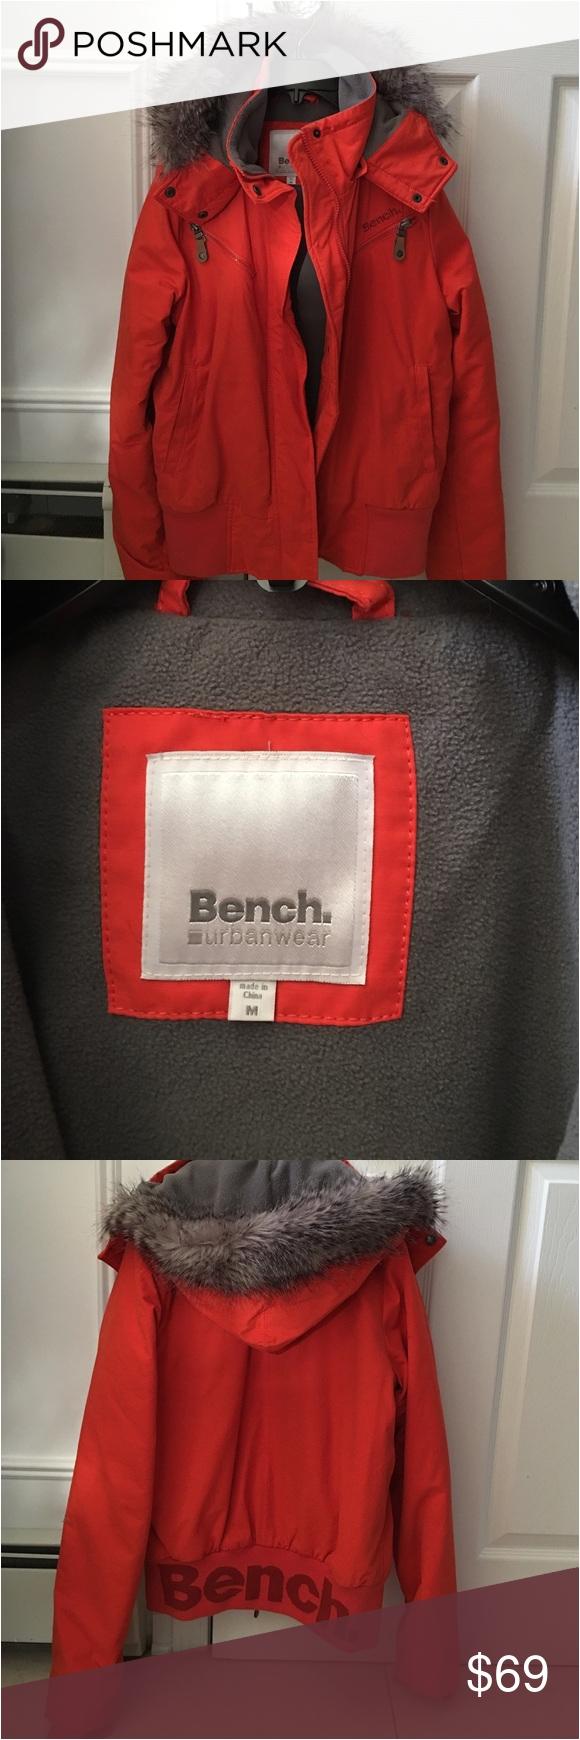 bench jacket womens size medium